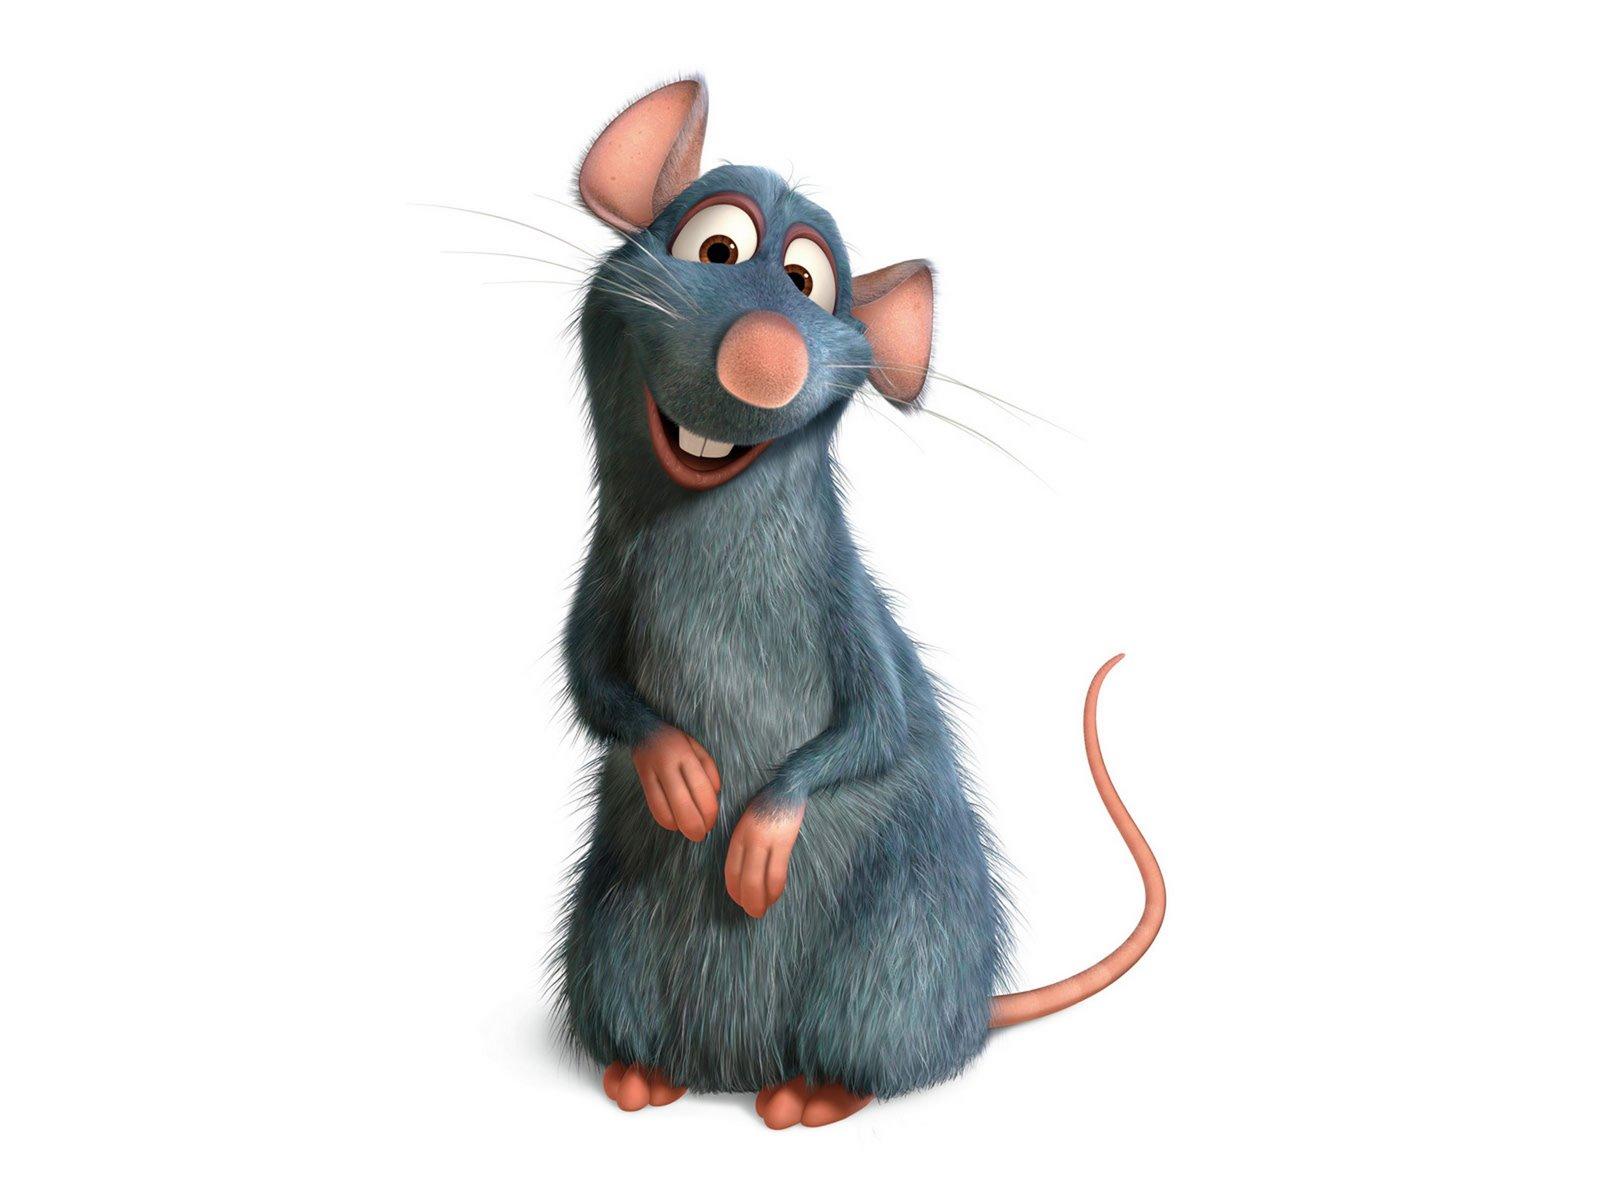 http://2.bp.blogspot.com/_WgPlX9w8B0k/TRyGUebAs4I/AAAAAAAAAf0/n3Cy2wNuMfY/s1600/Ratatouille.jpg